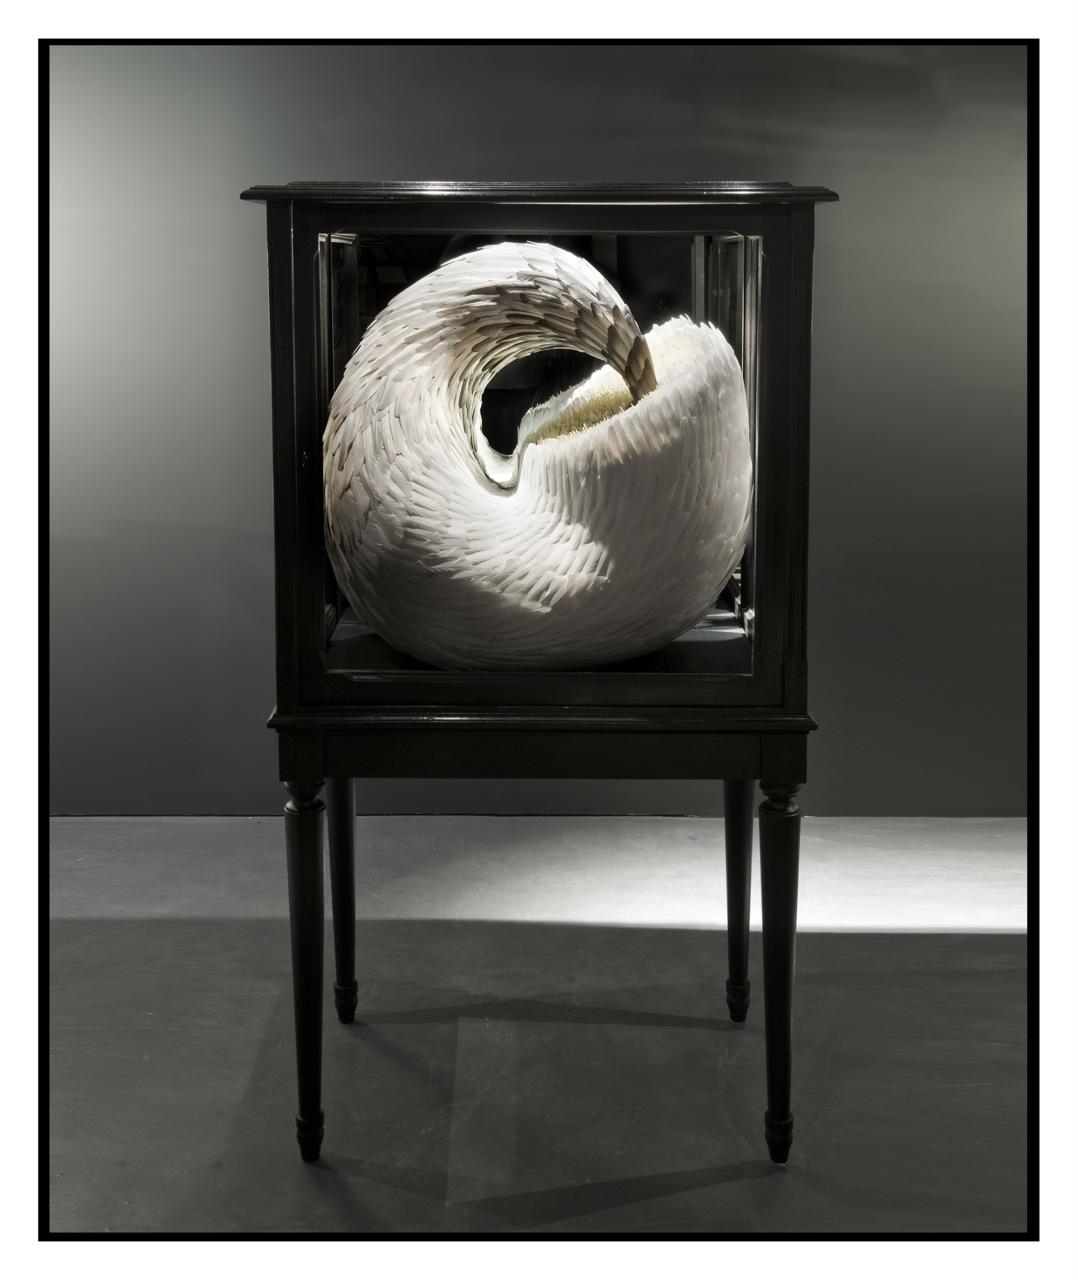 Charles-Matton-Studio-of-a-Rhinoceros-Sculptor-2001-©-Courtesy-All-Visual-Arts-photography-Tessa-Angus